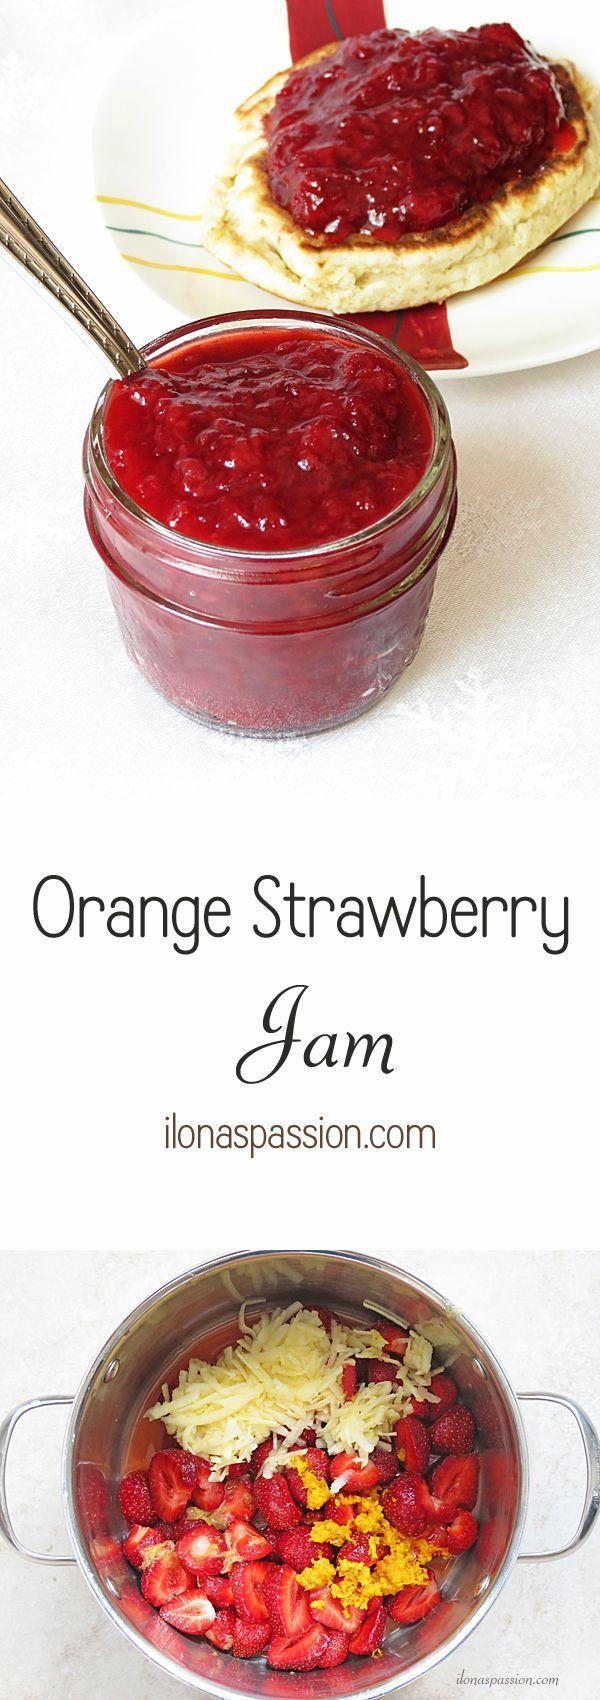 Strawberry jam with orange, lemon and apple flavor by http://ilonaspassion.com #jam #strawberry #nopectin #orange